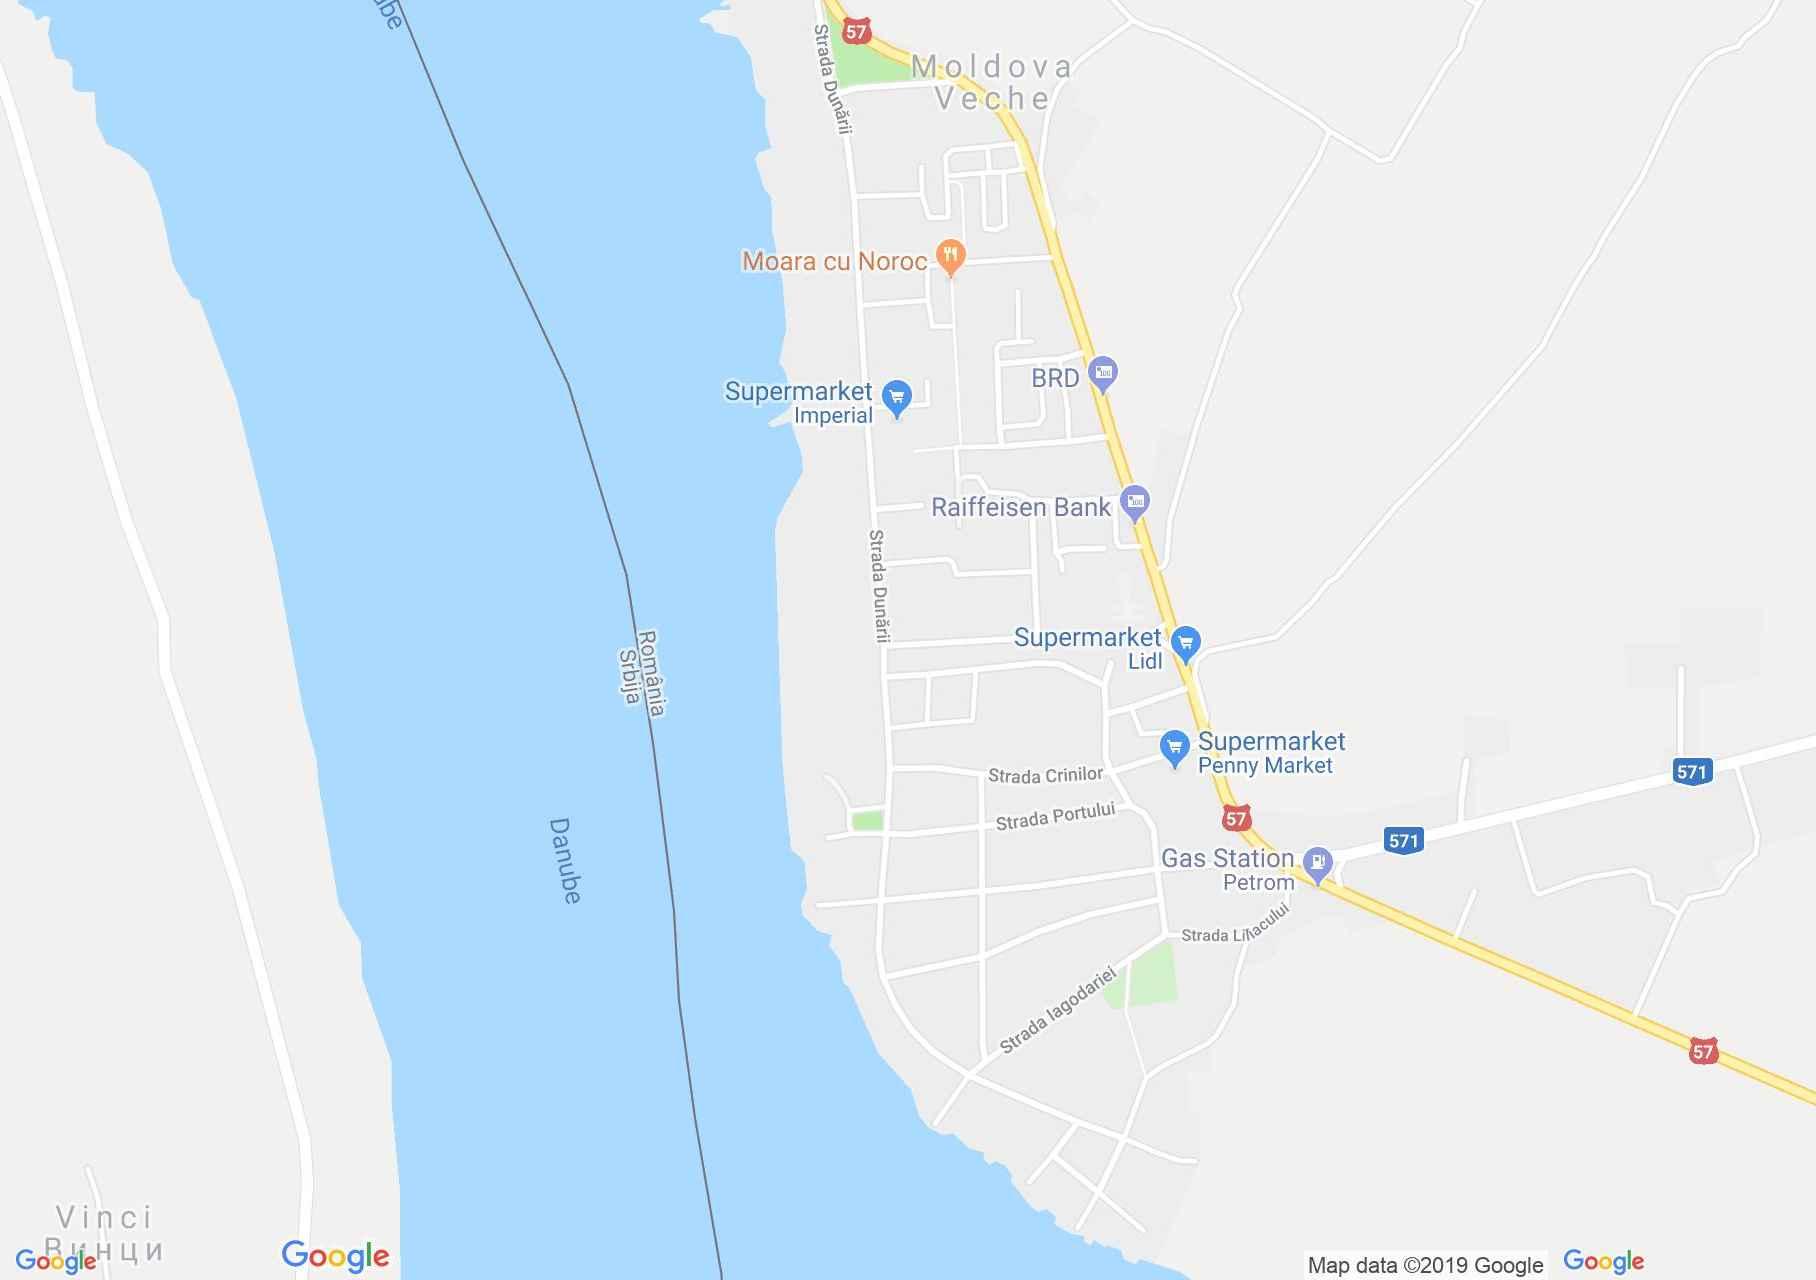 Map of Moldova Veche: Serbian church